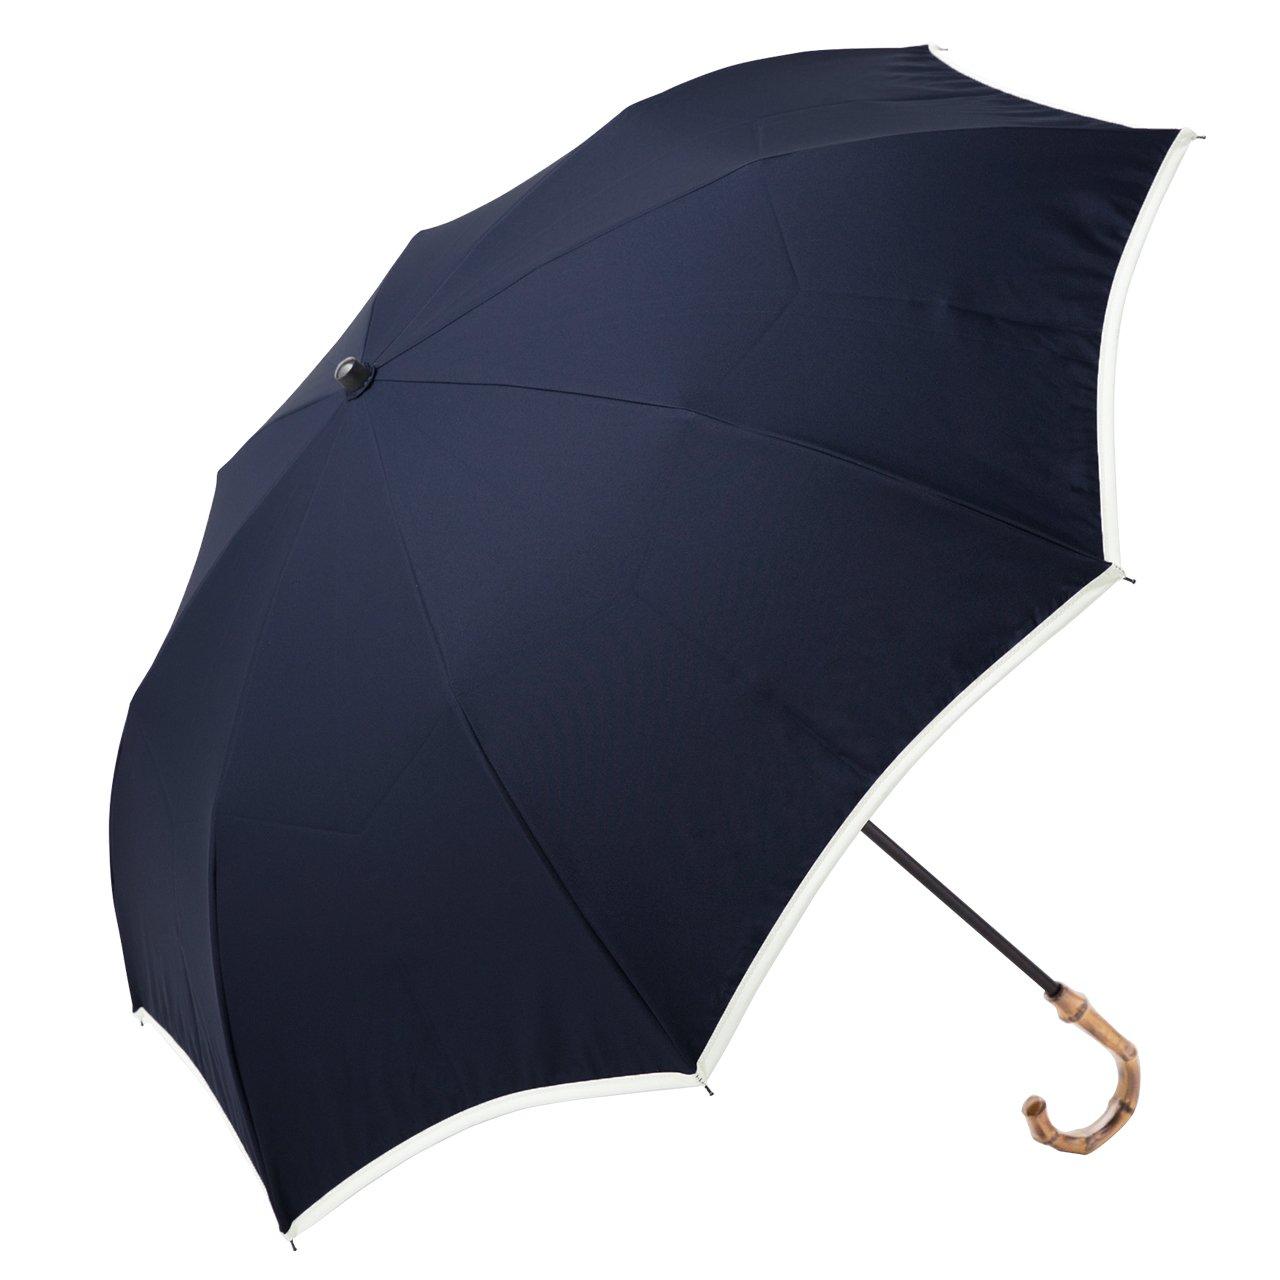 【Rose Blanc】100%完全遮光 日傘 晴雨兼用 パイピング(傘袋付) 2段折りたたみ 50cm (ネイビー×アイボリー) B06XTDM946ネイビー×アイボリー